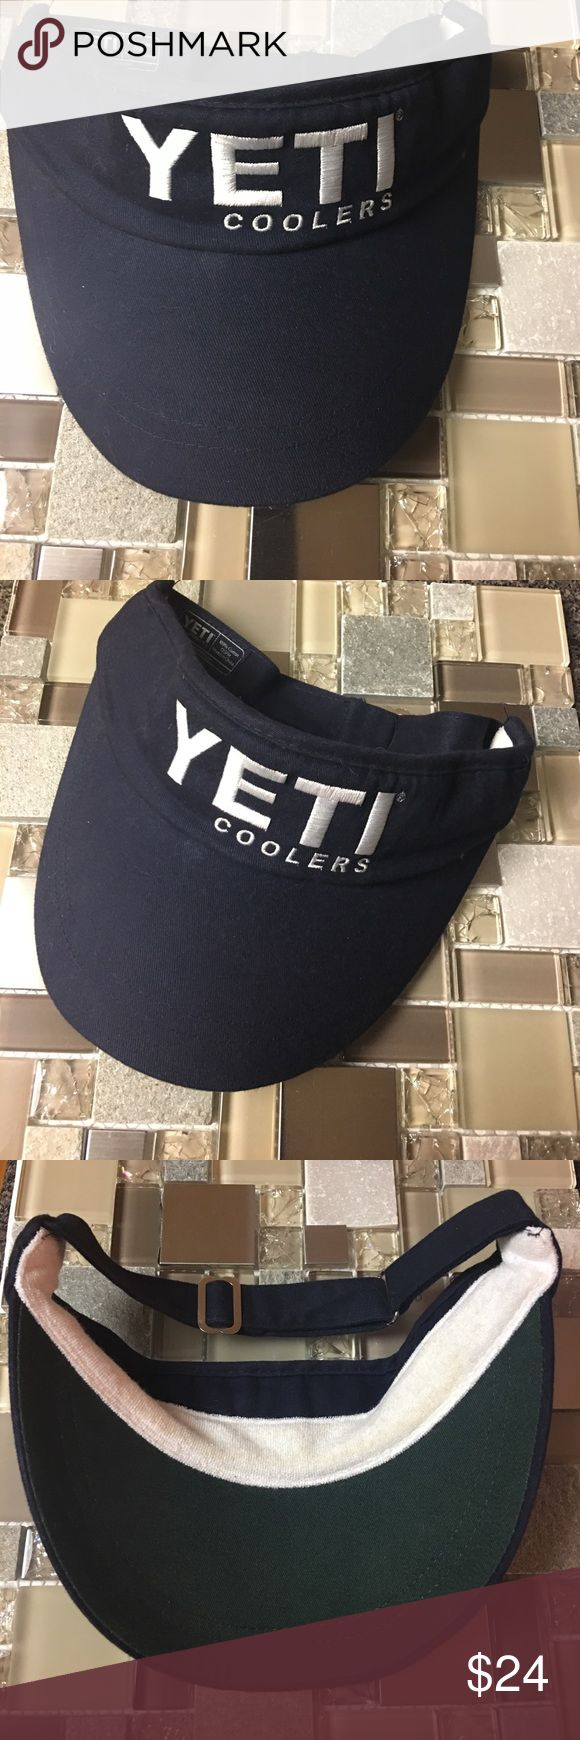 YETI Coolers navy blue and white adjustable visor YETI visor - barely worn - GREAT condition. YETI Accessories Hats